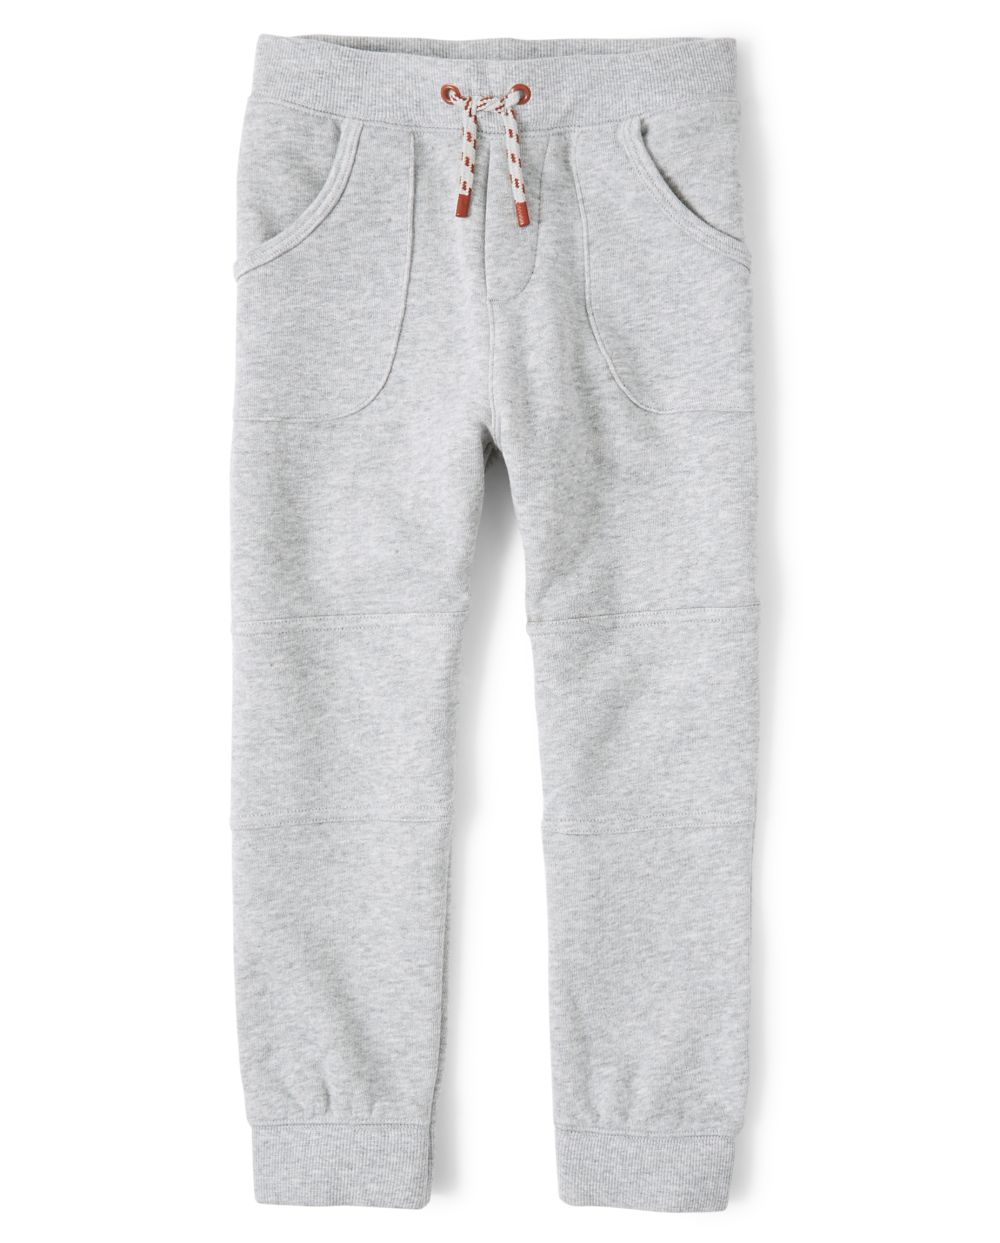 Boys Fleece Jogger Pants - Every Day Play